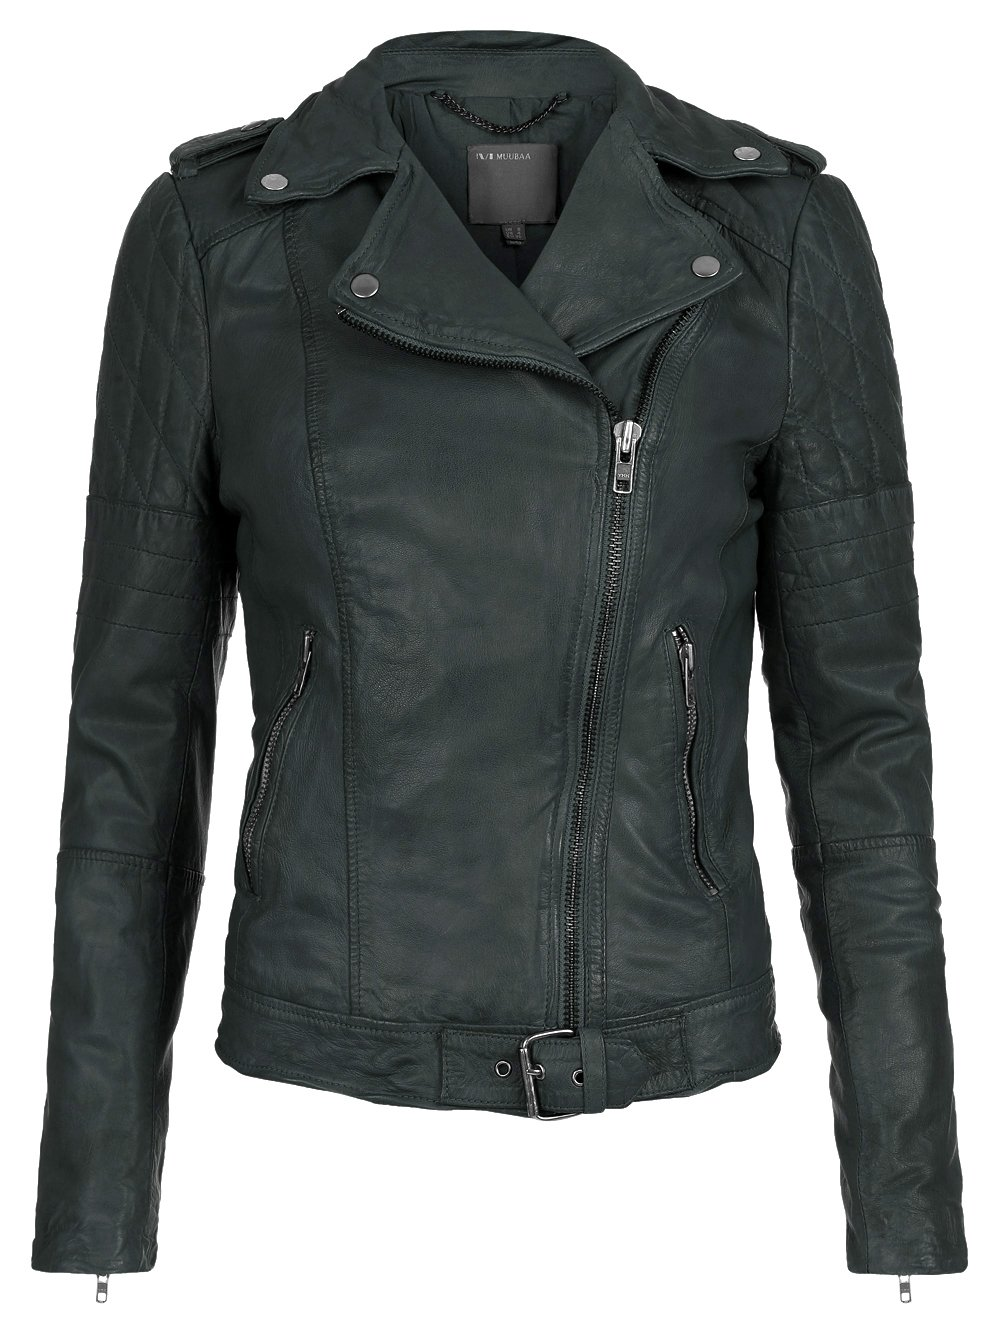 Green leather biker jacket